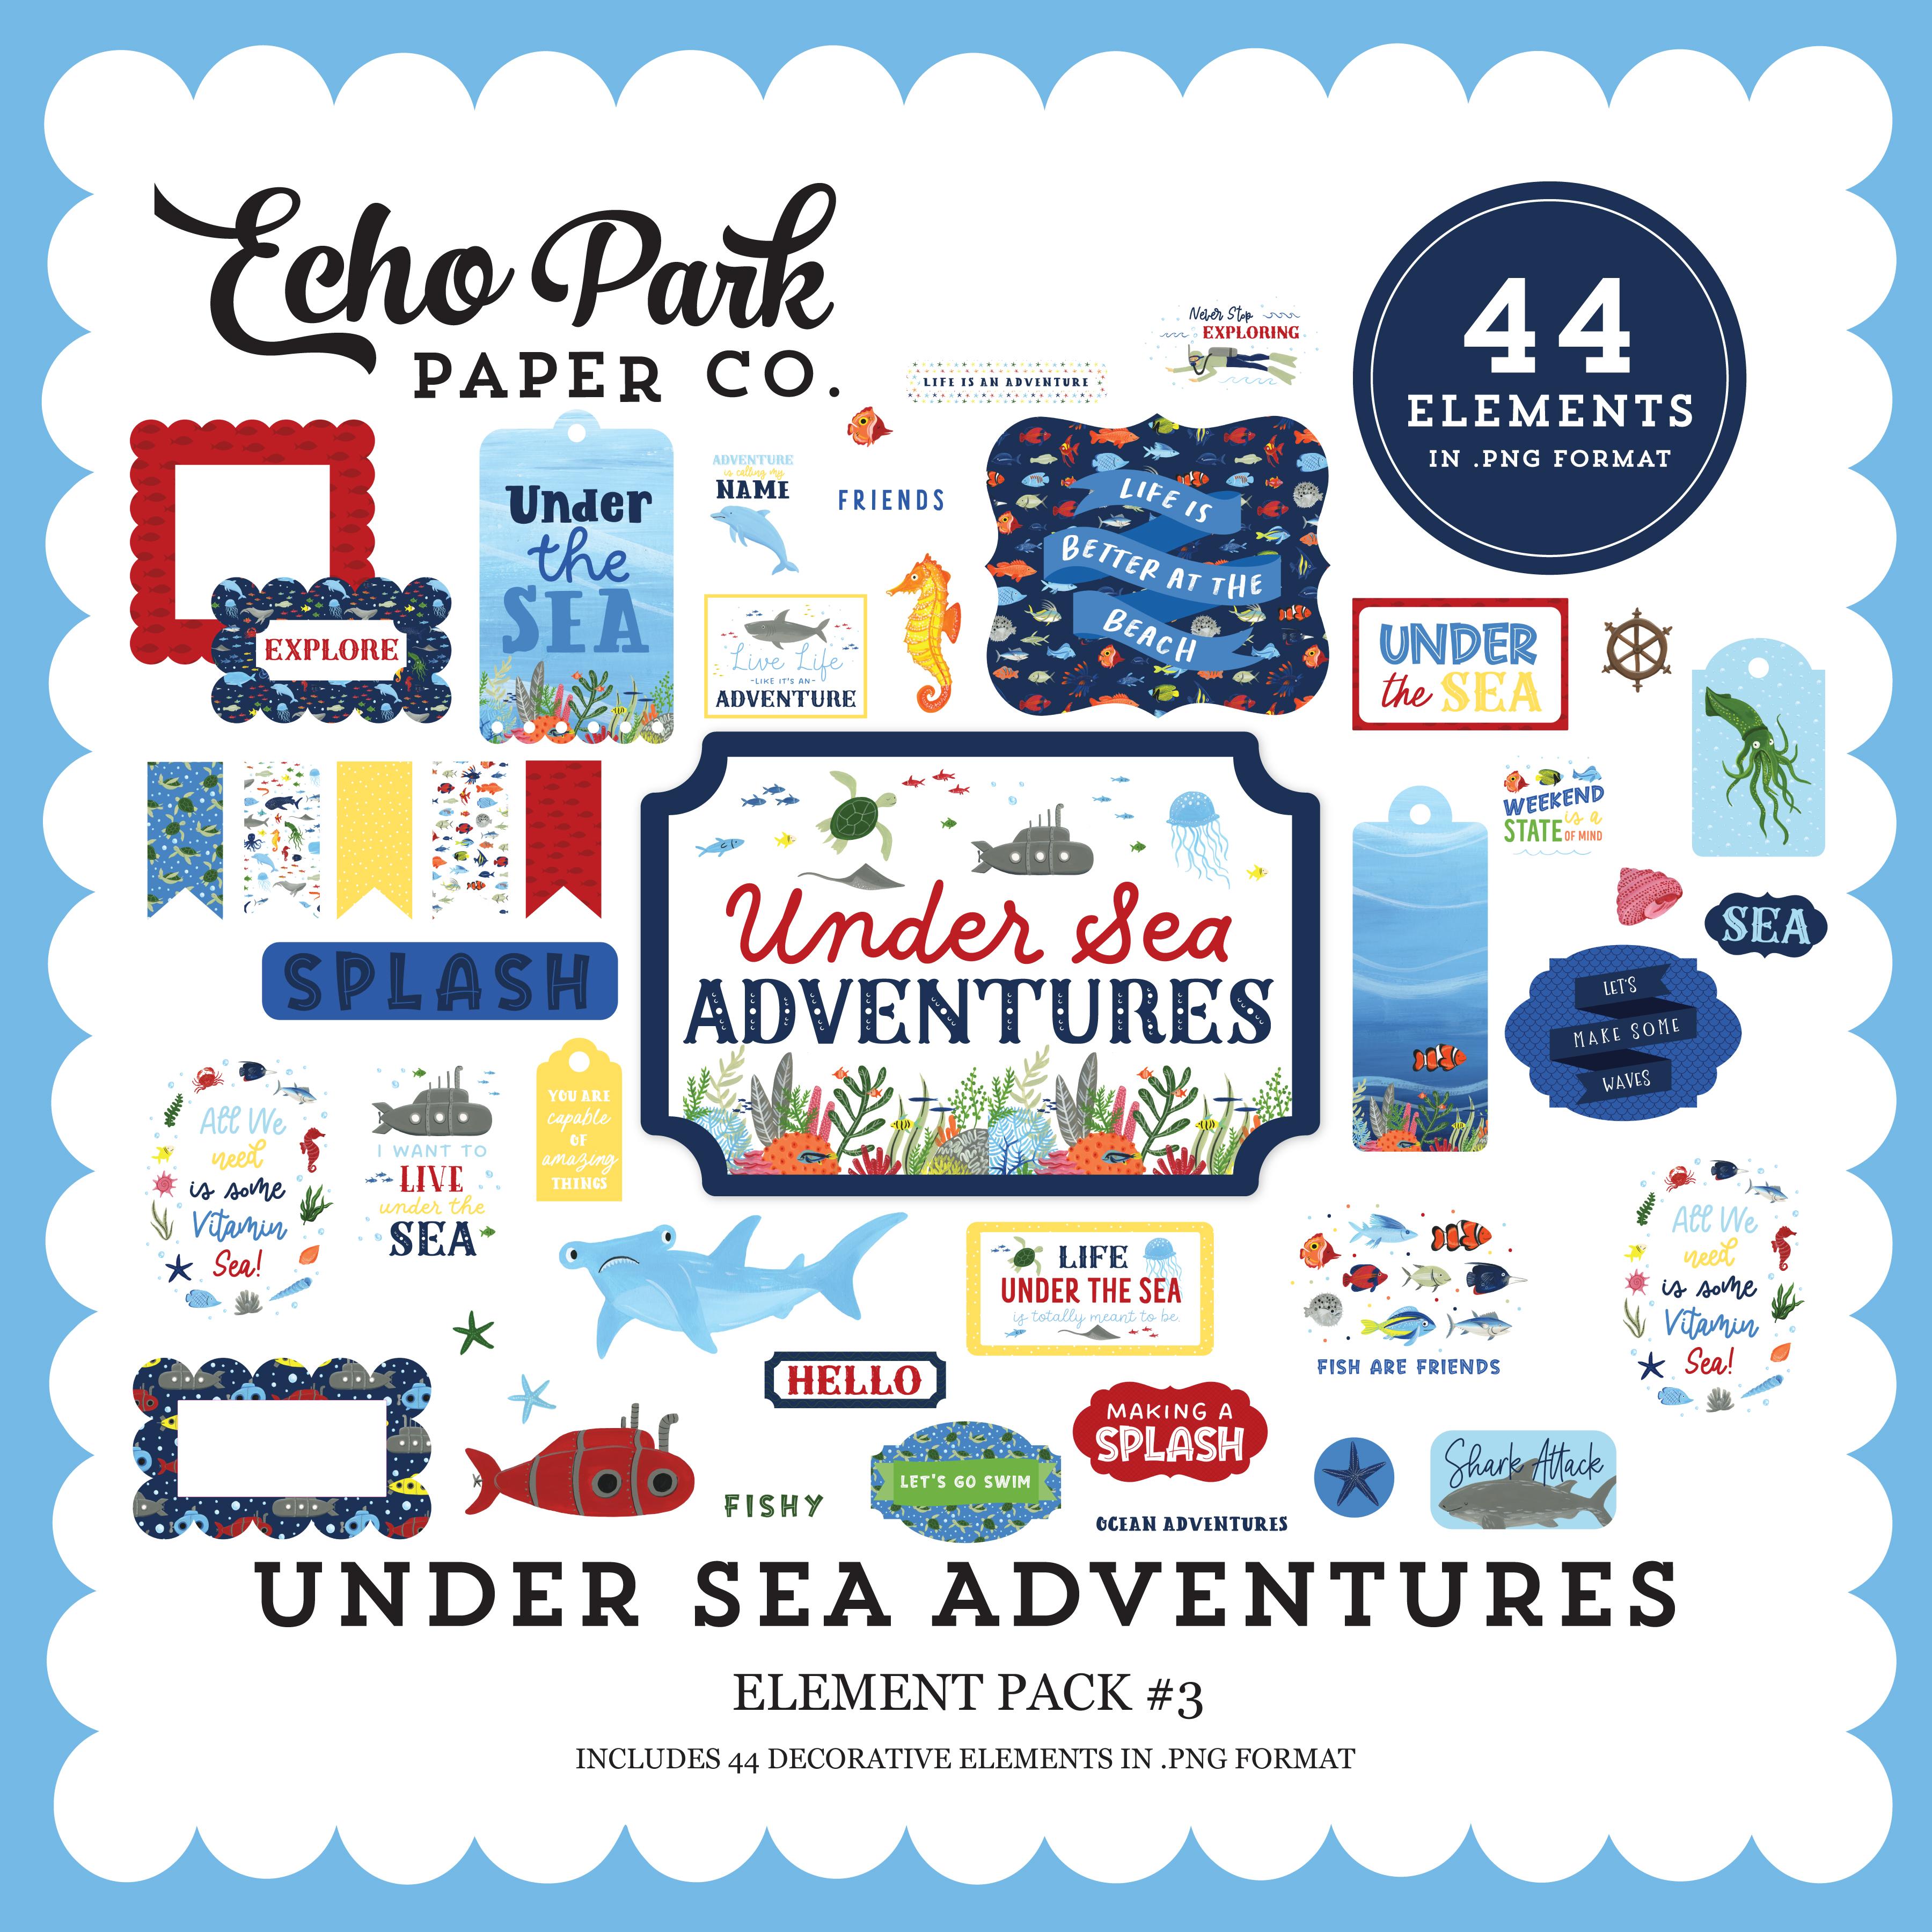 Under Sea Adventures Element Pack #3